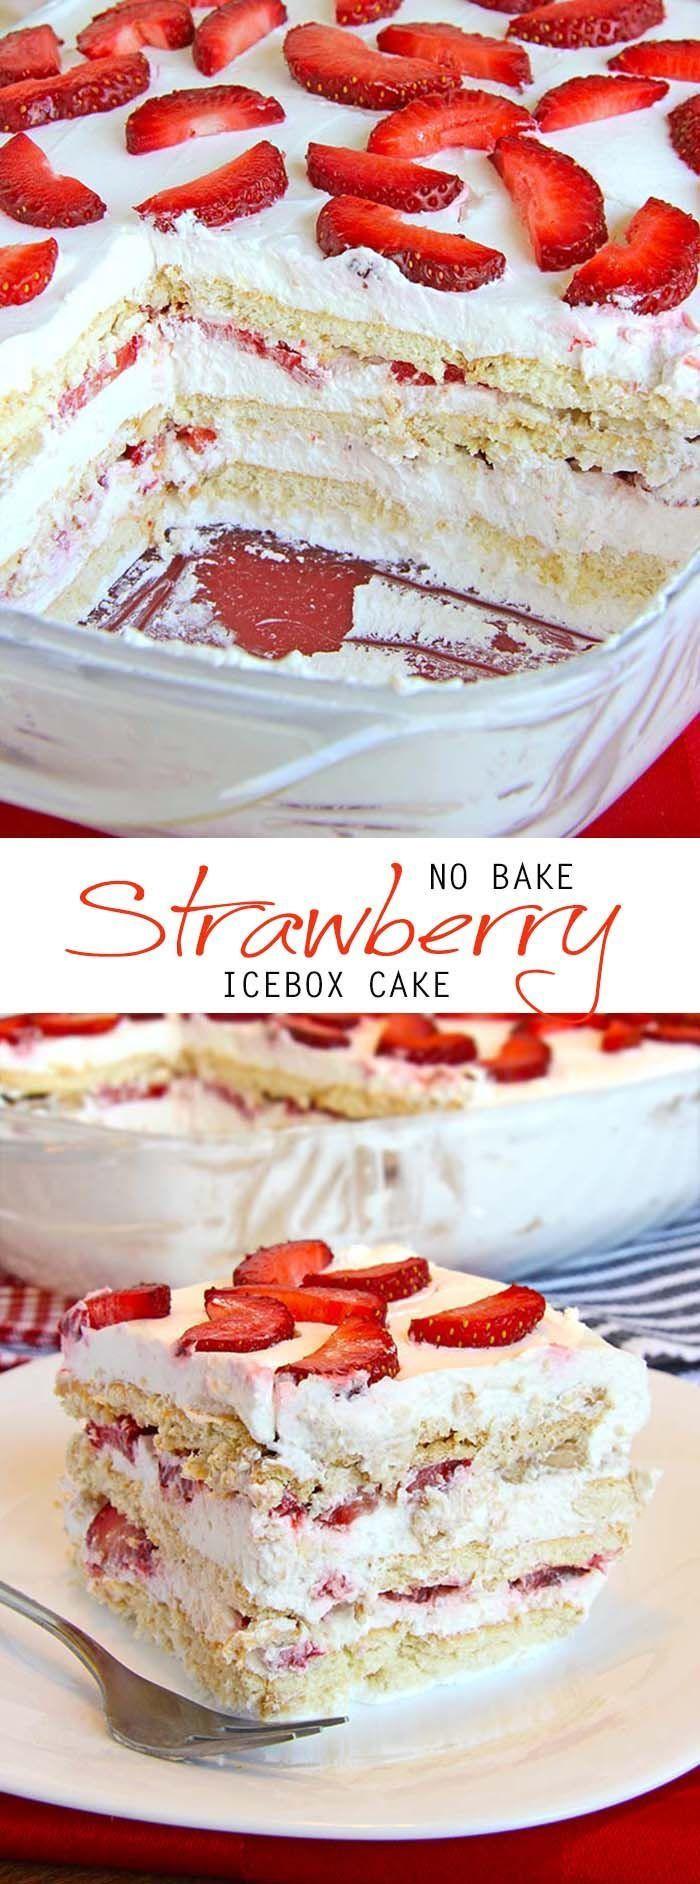 Summer Strawberry Desserts  No Bake Strawberry Icebox Cake Recipe